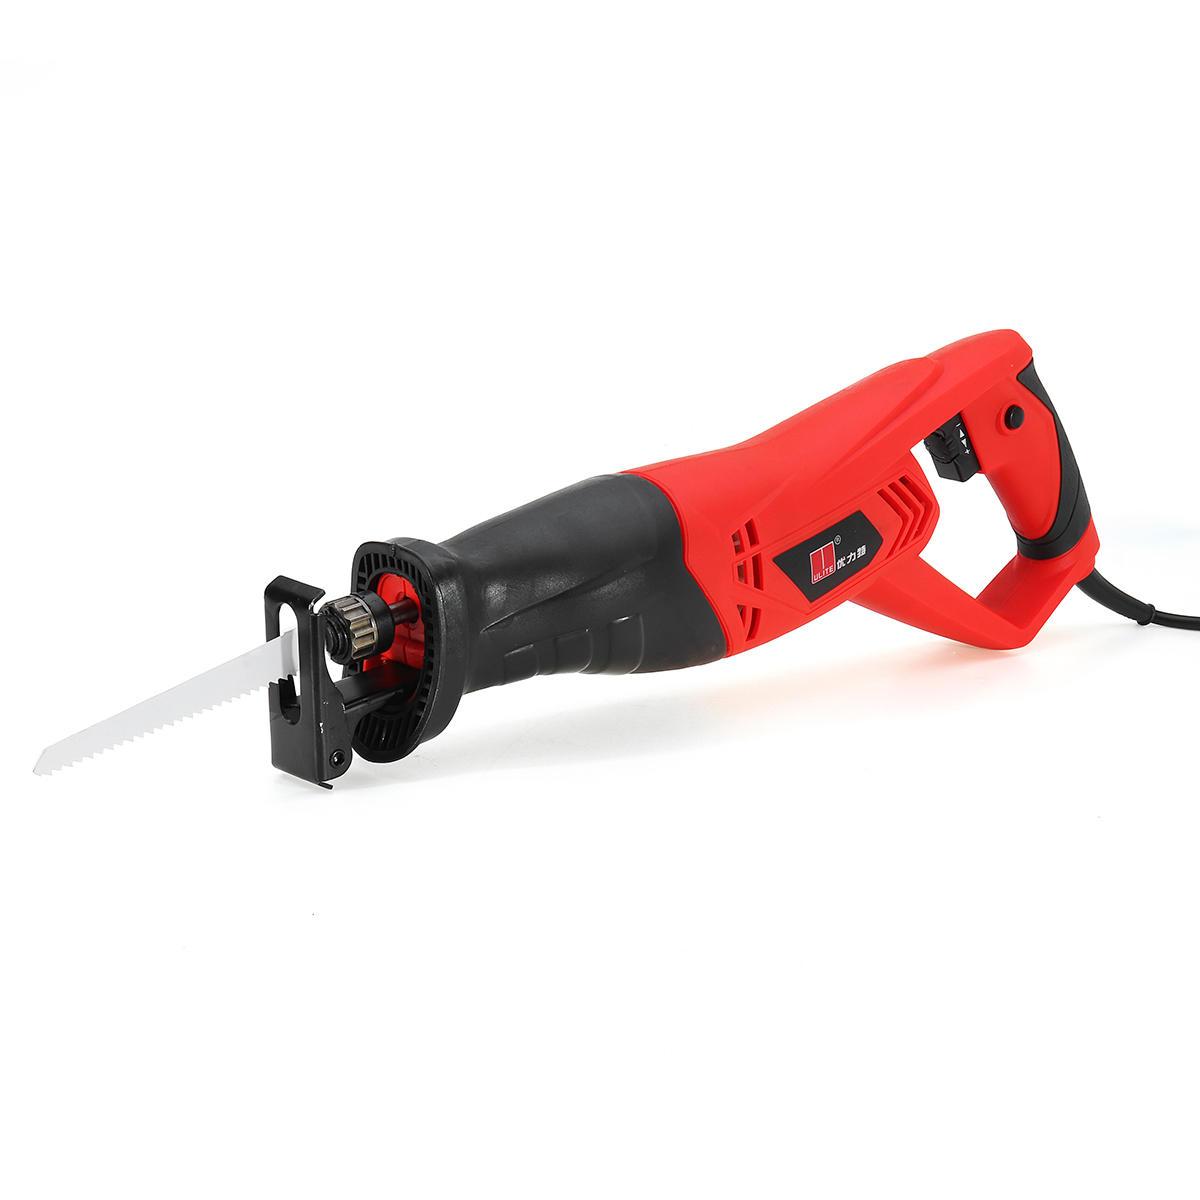 220V 900W Electric Reciprocating Sabre Saw 2 Blades Wood Metal Plastic Pruning Tool